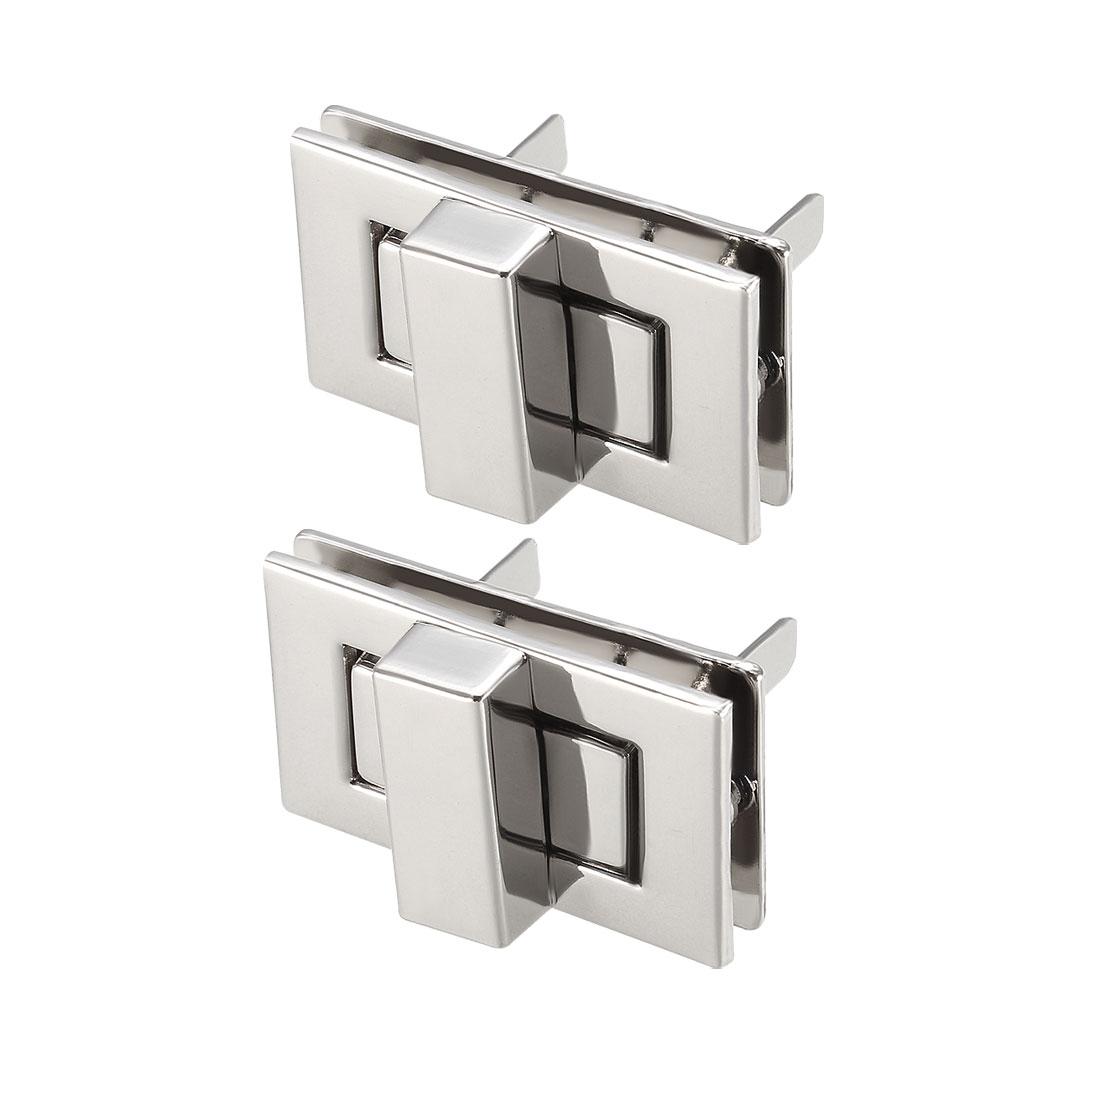 2 Sets Rectangular Purses Twist Lock 32mm x 20mm Clutches Closures - Silver